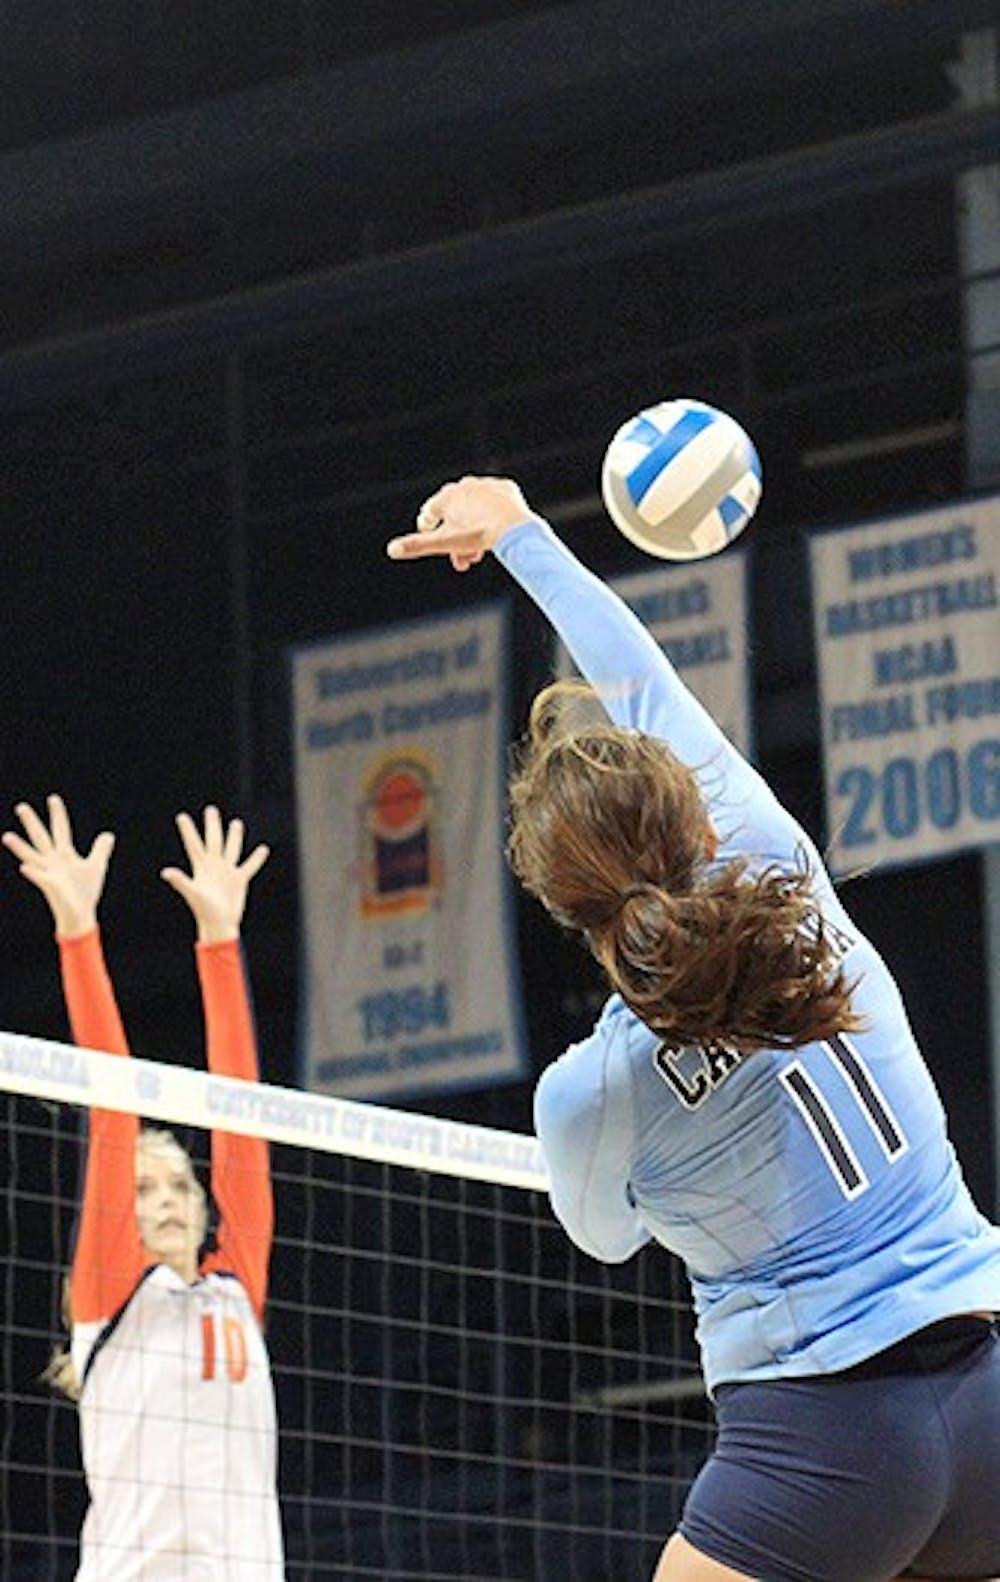 "<p><span class=""caps"">UNC</span> senior Emily McGee spikes the ball Saturday against Virginia. McGee had 10 kills against the Cavaliers. </p>"